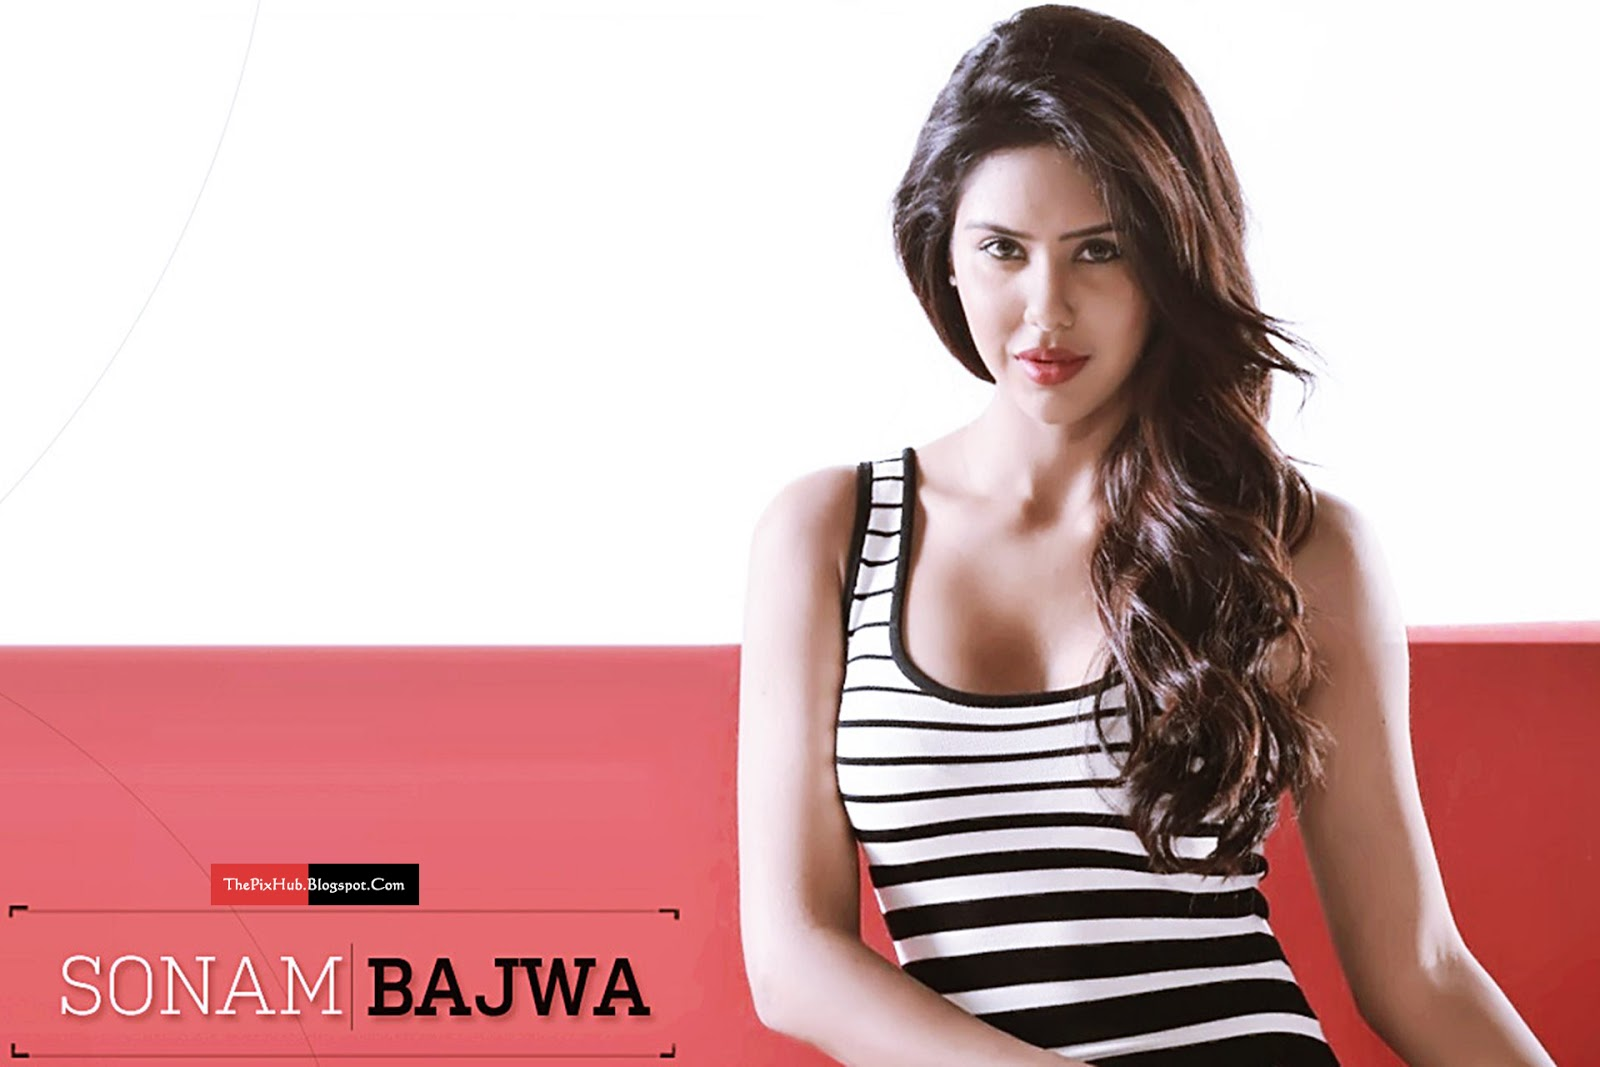 Sonam Bajwa Passion Hd Wallpaper